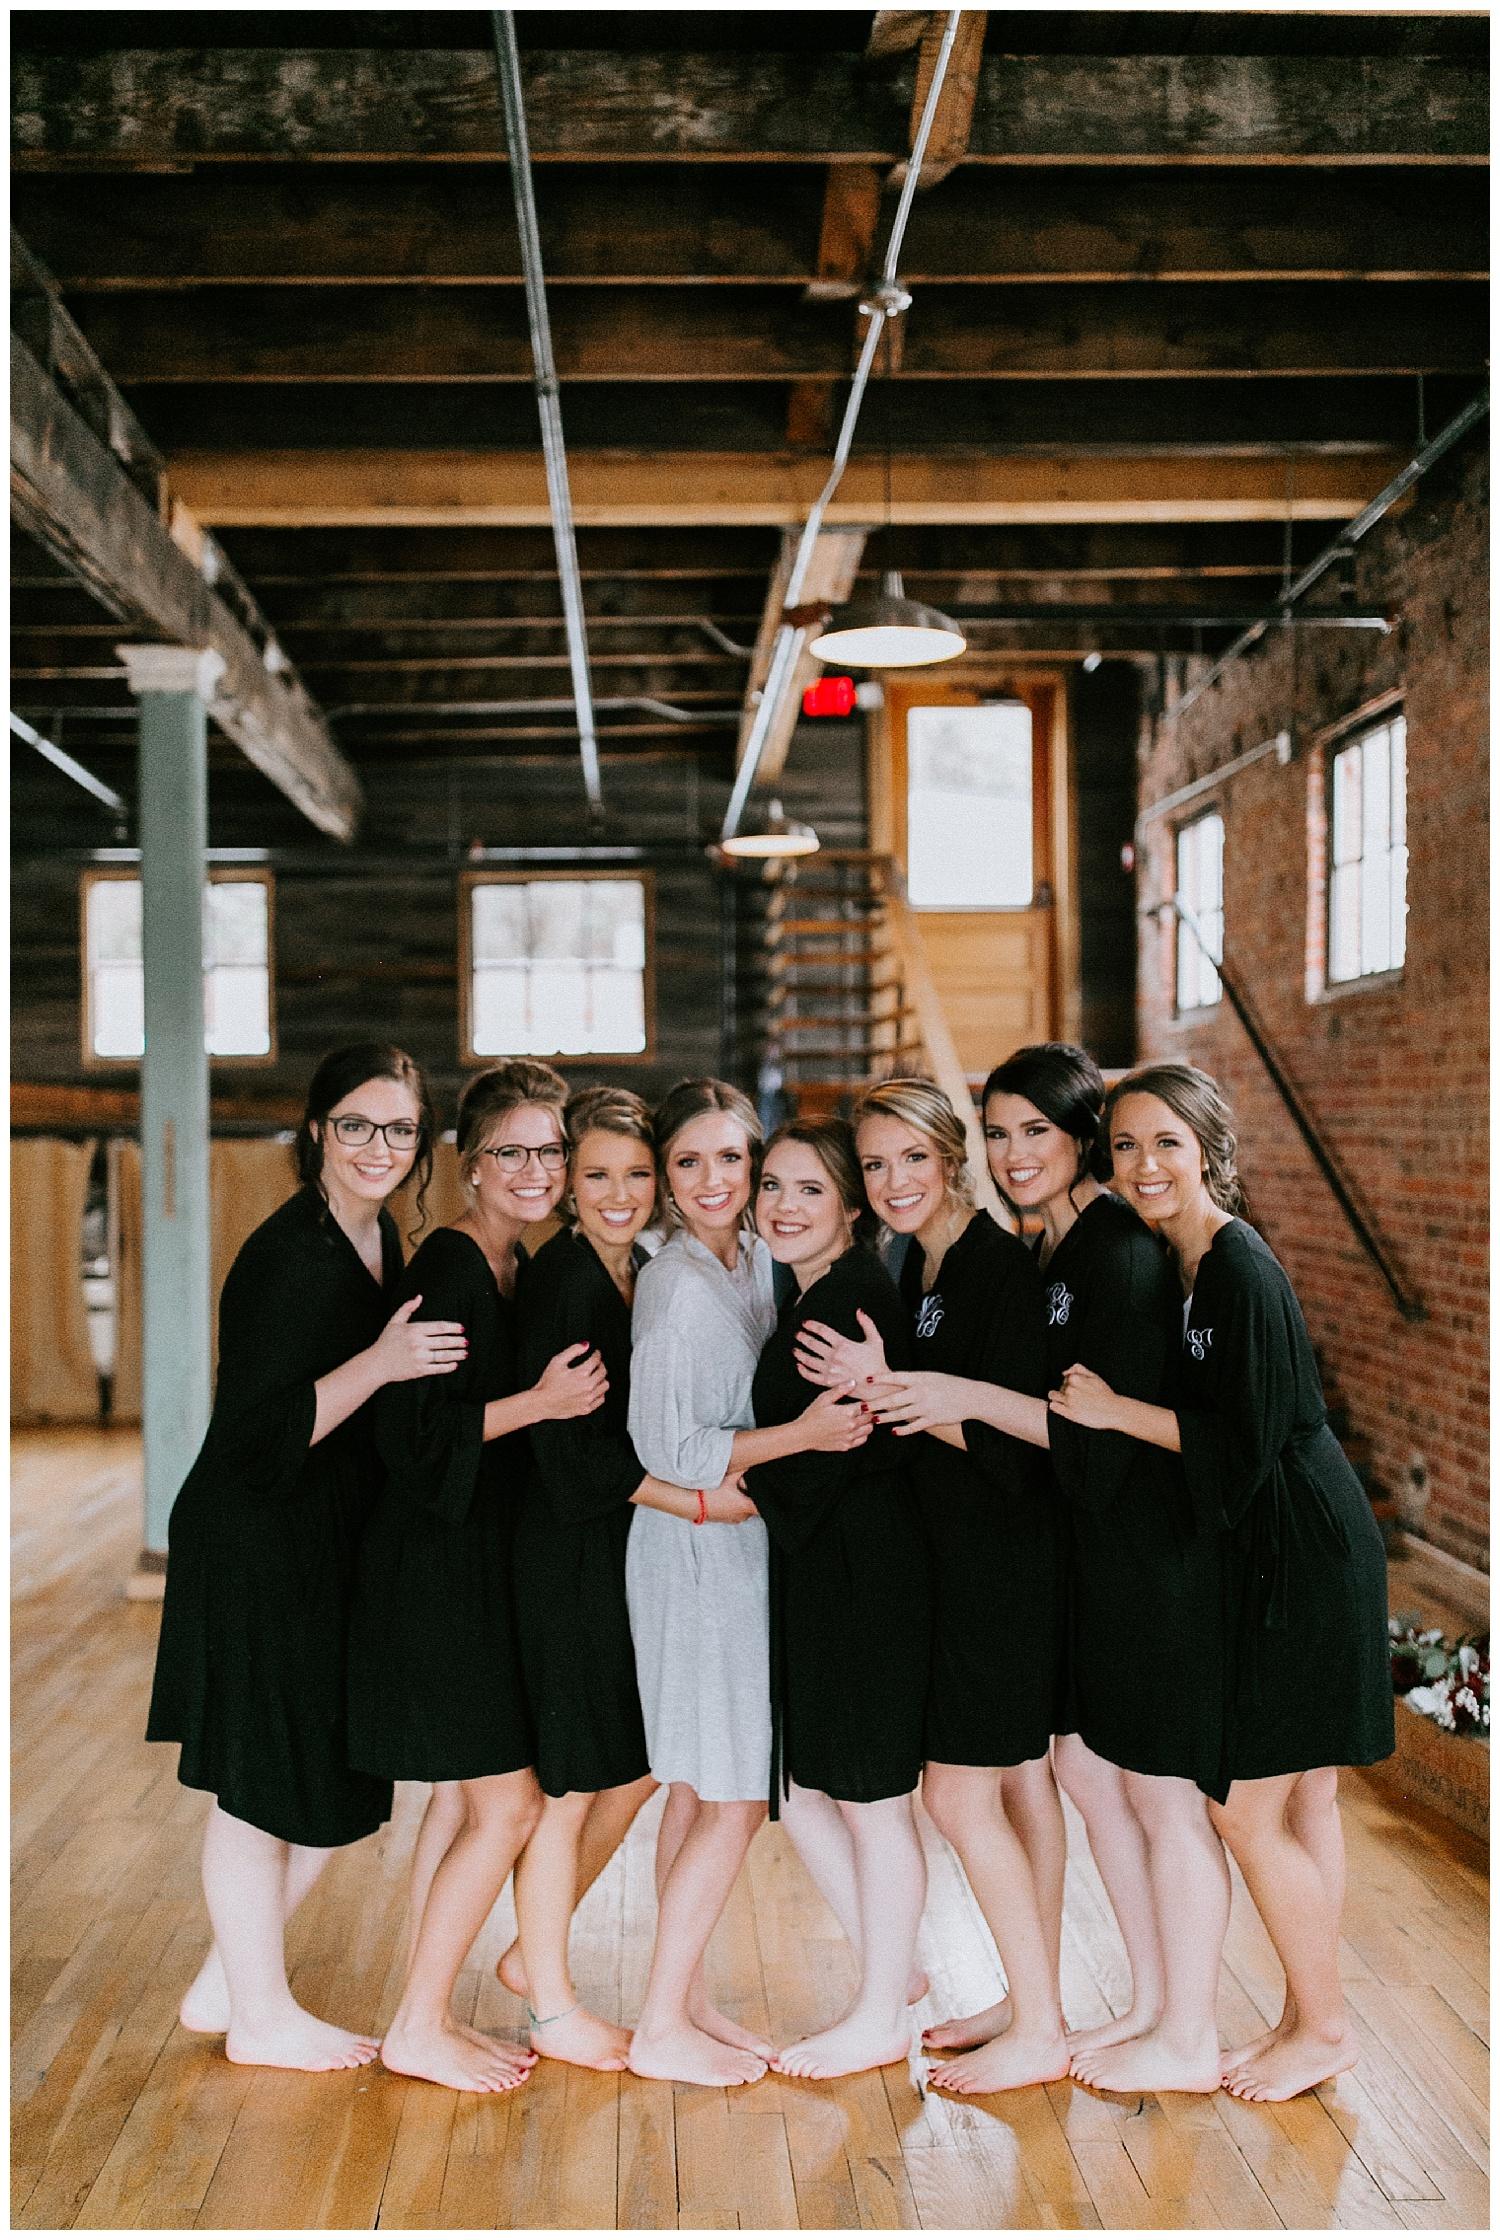 winter-wedding-the standard-knoxville_2019-01-23_0009.jpg